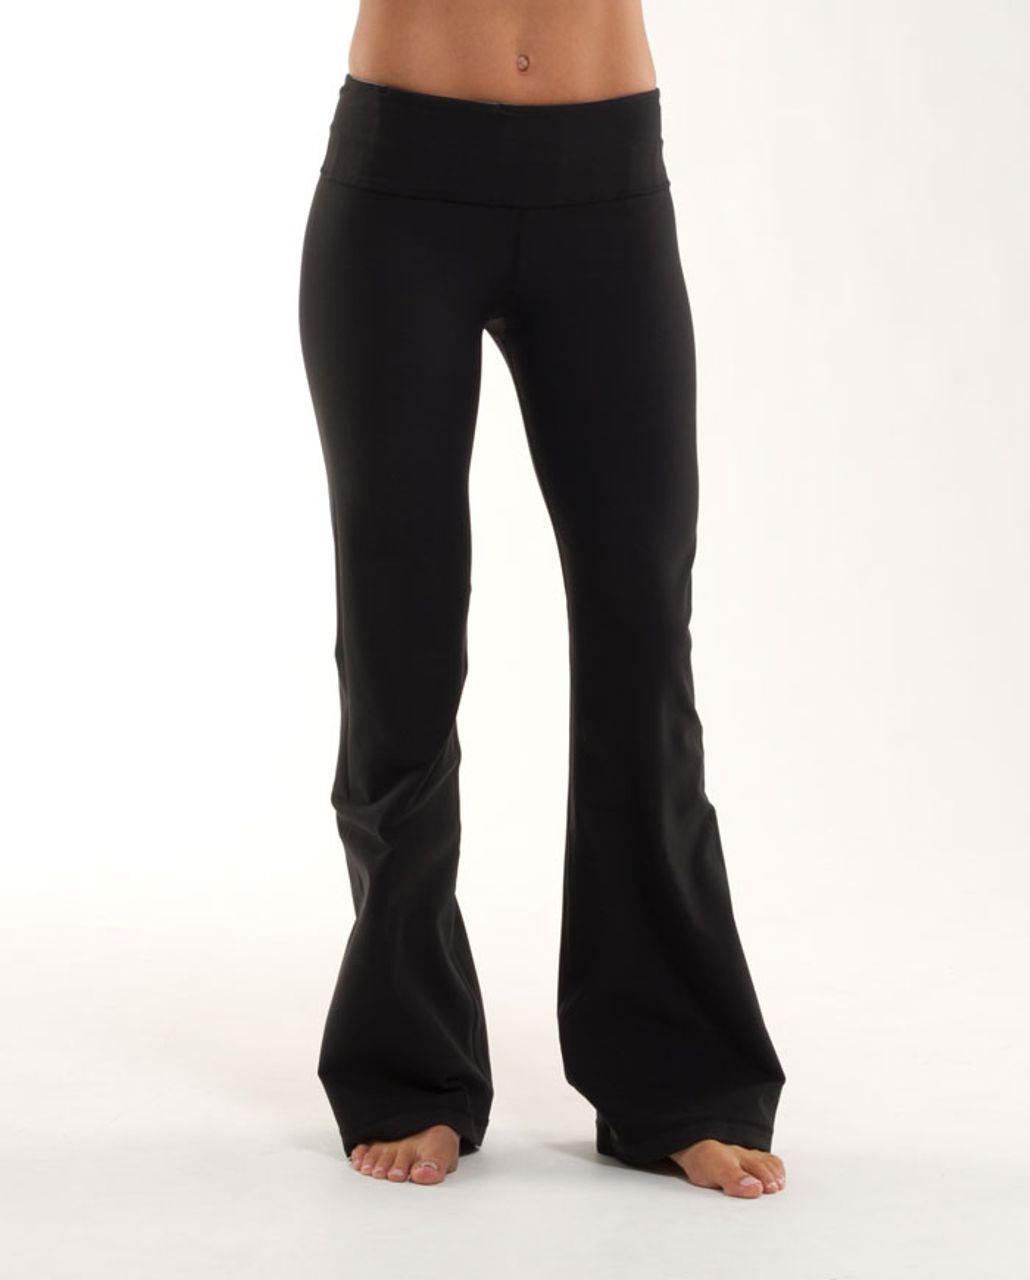 Lululemon Groove Pant (Regular) - Black /  Heathered Blurred Grey /  Quilting Winter 18